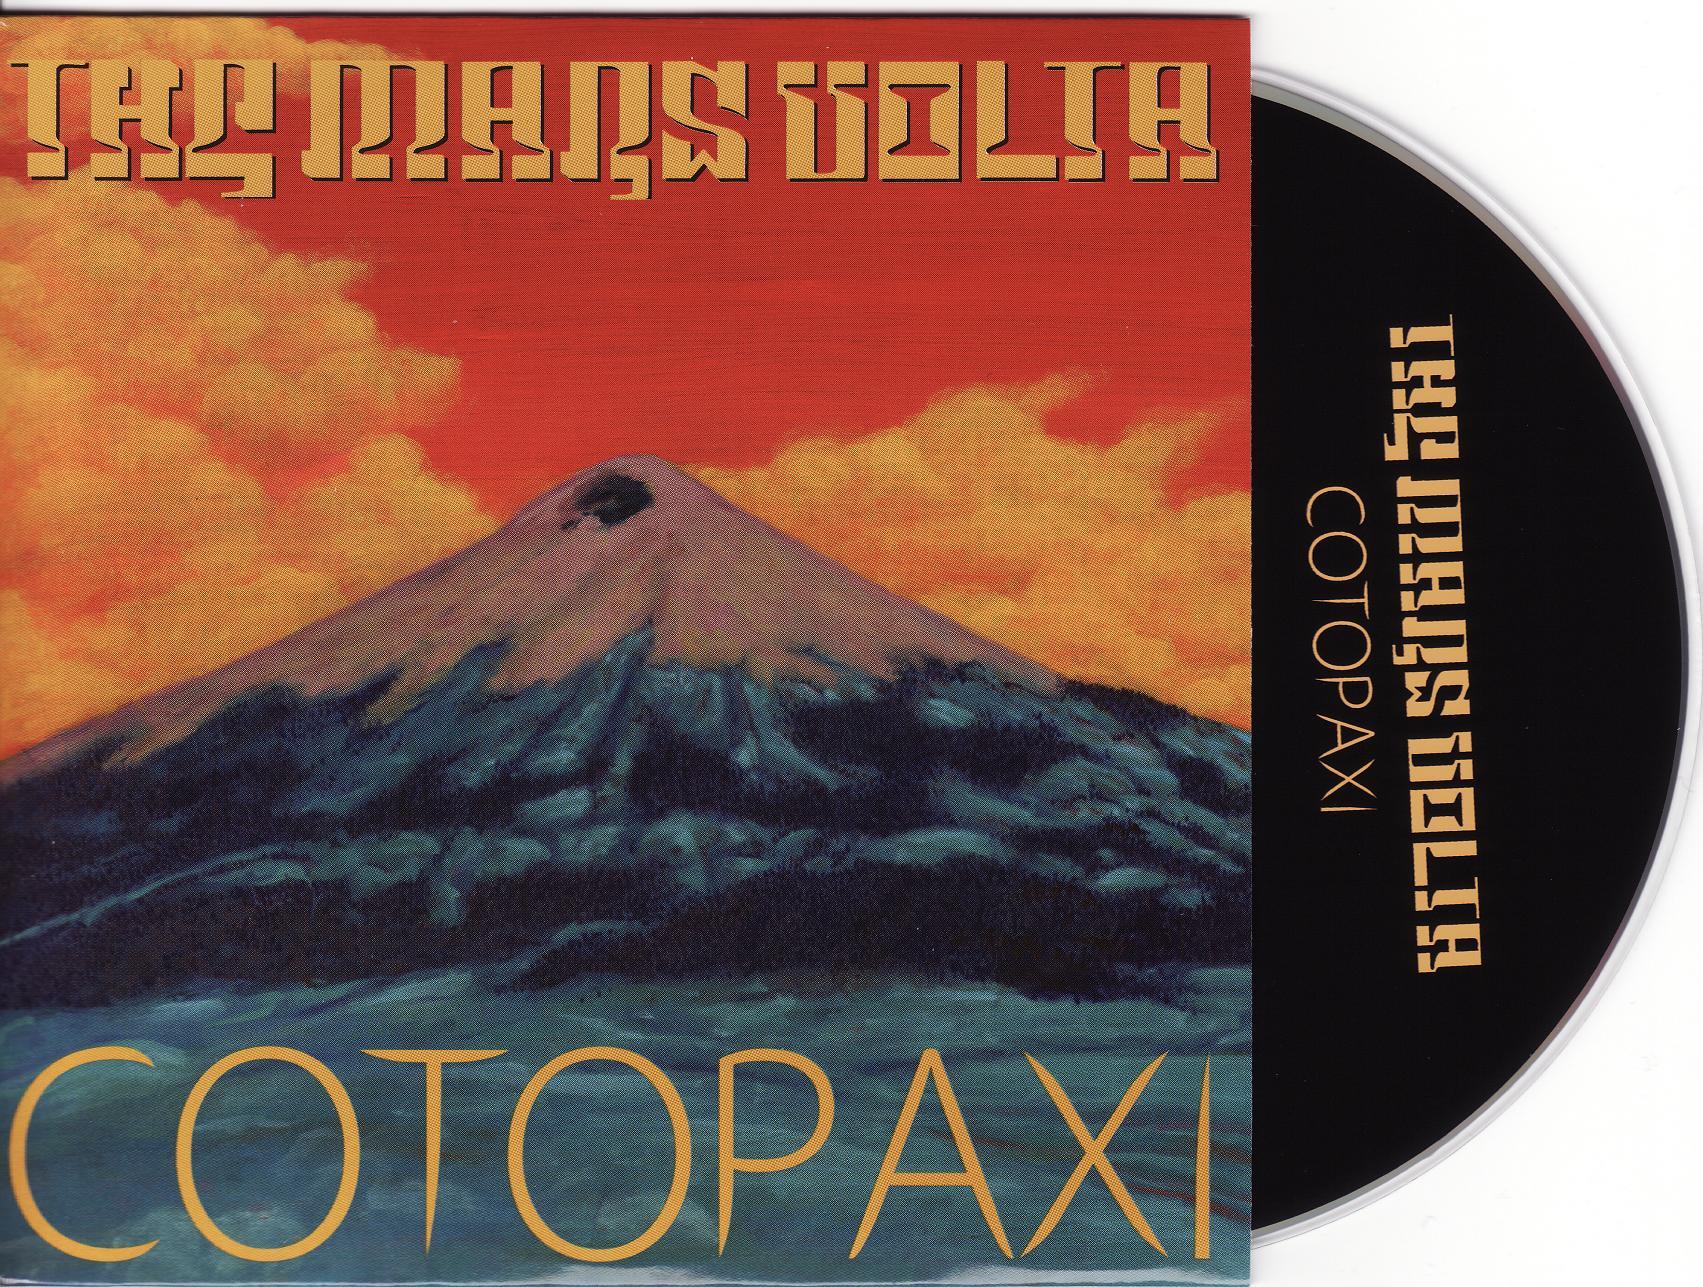 Cotopaxi [Single]: Album Cover